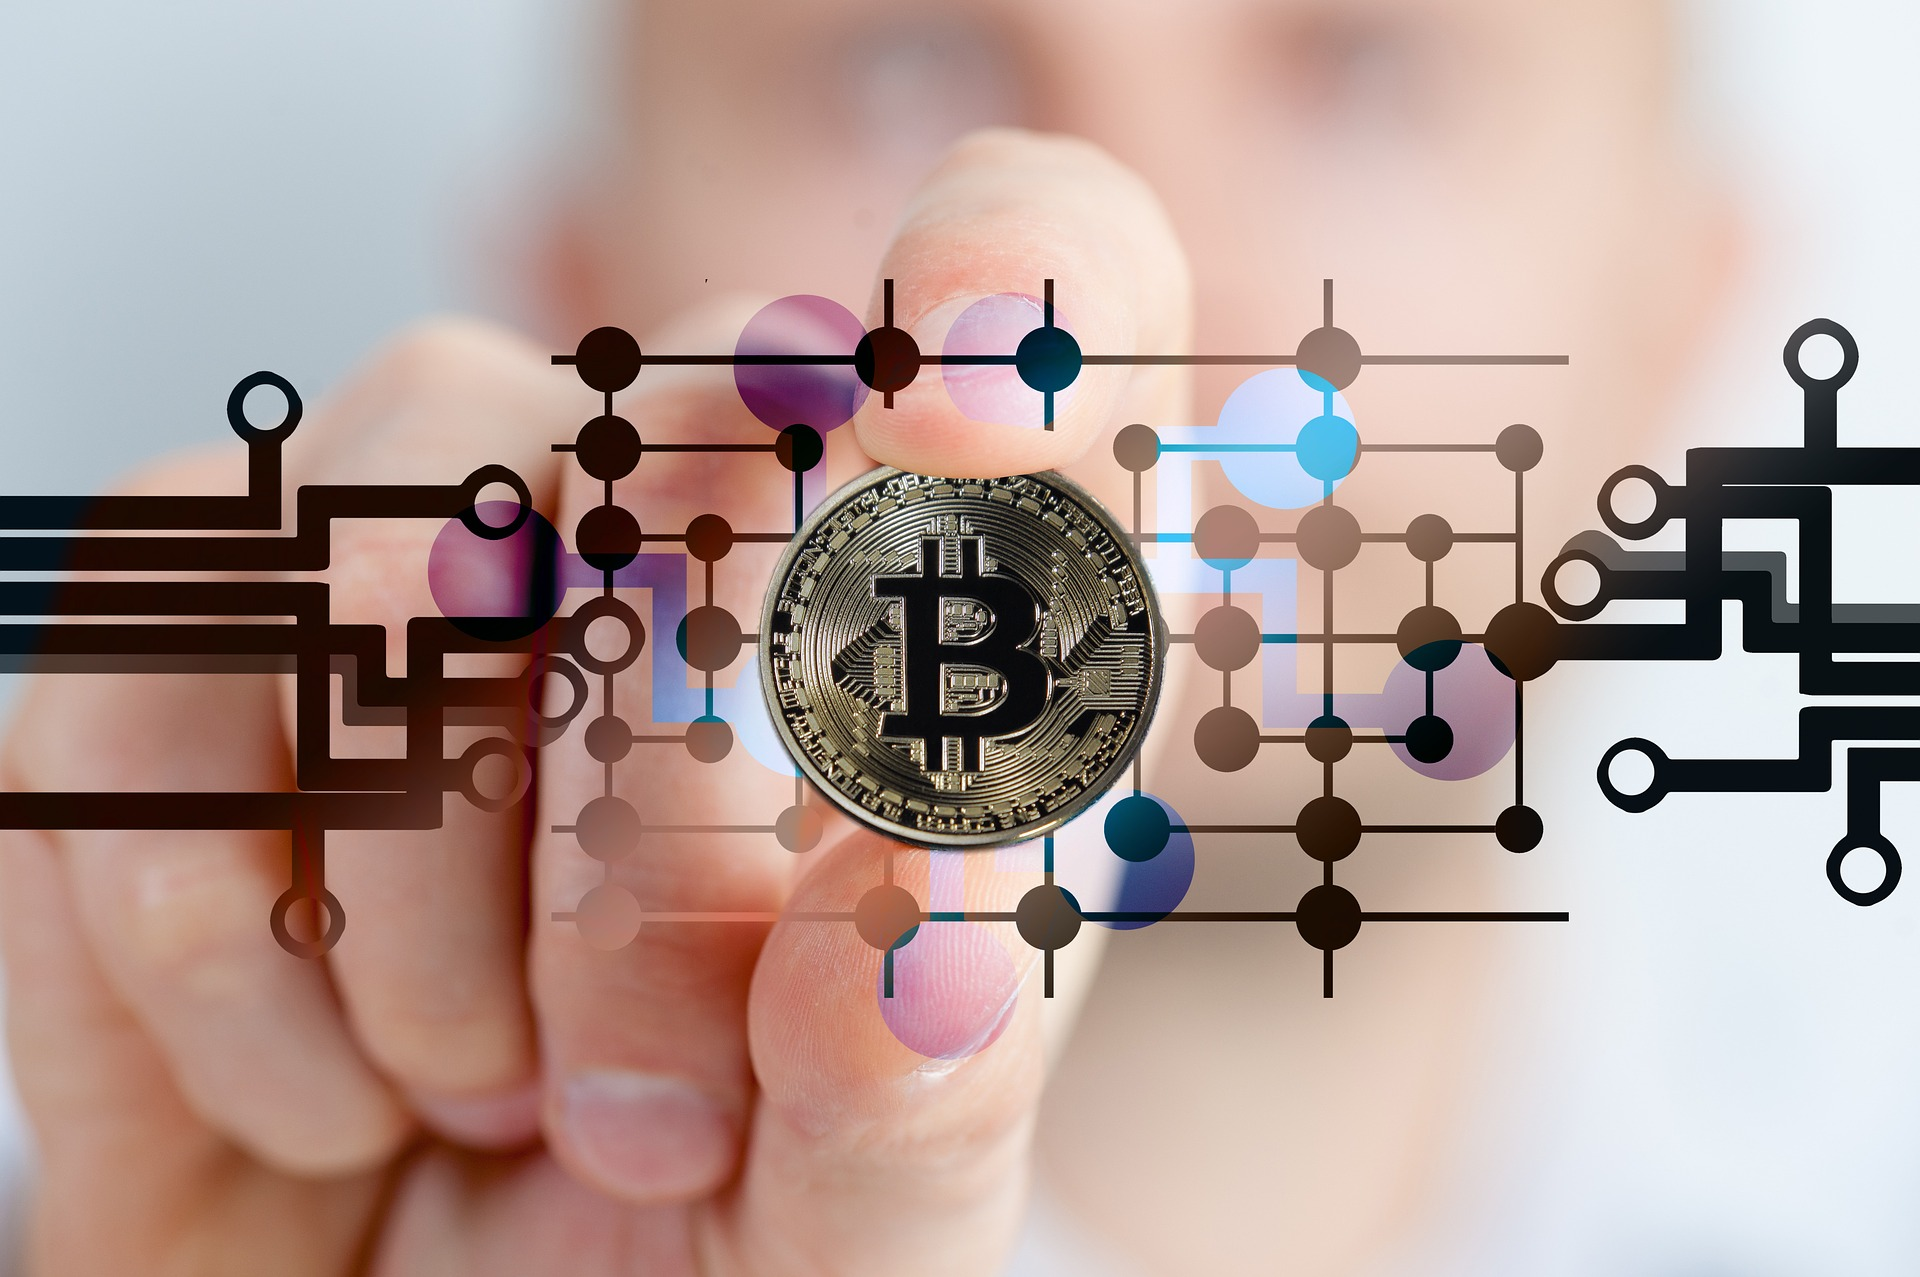 iniciante de investimento em criptomoeda frase sobre criptomoedas